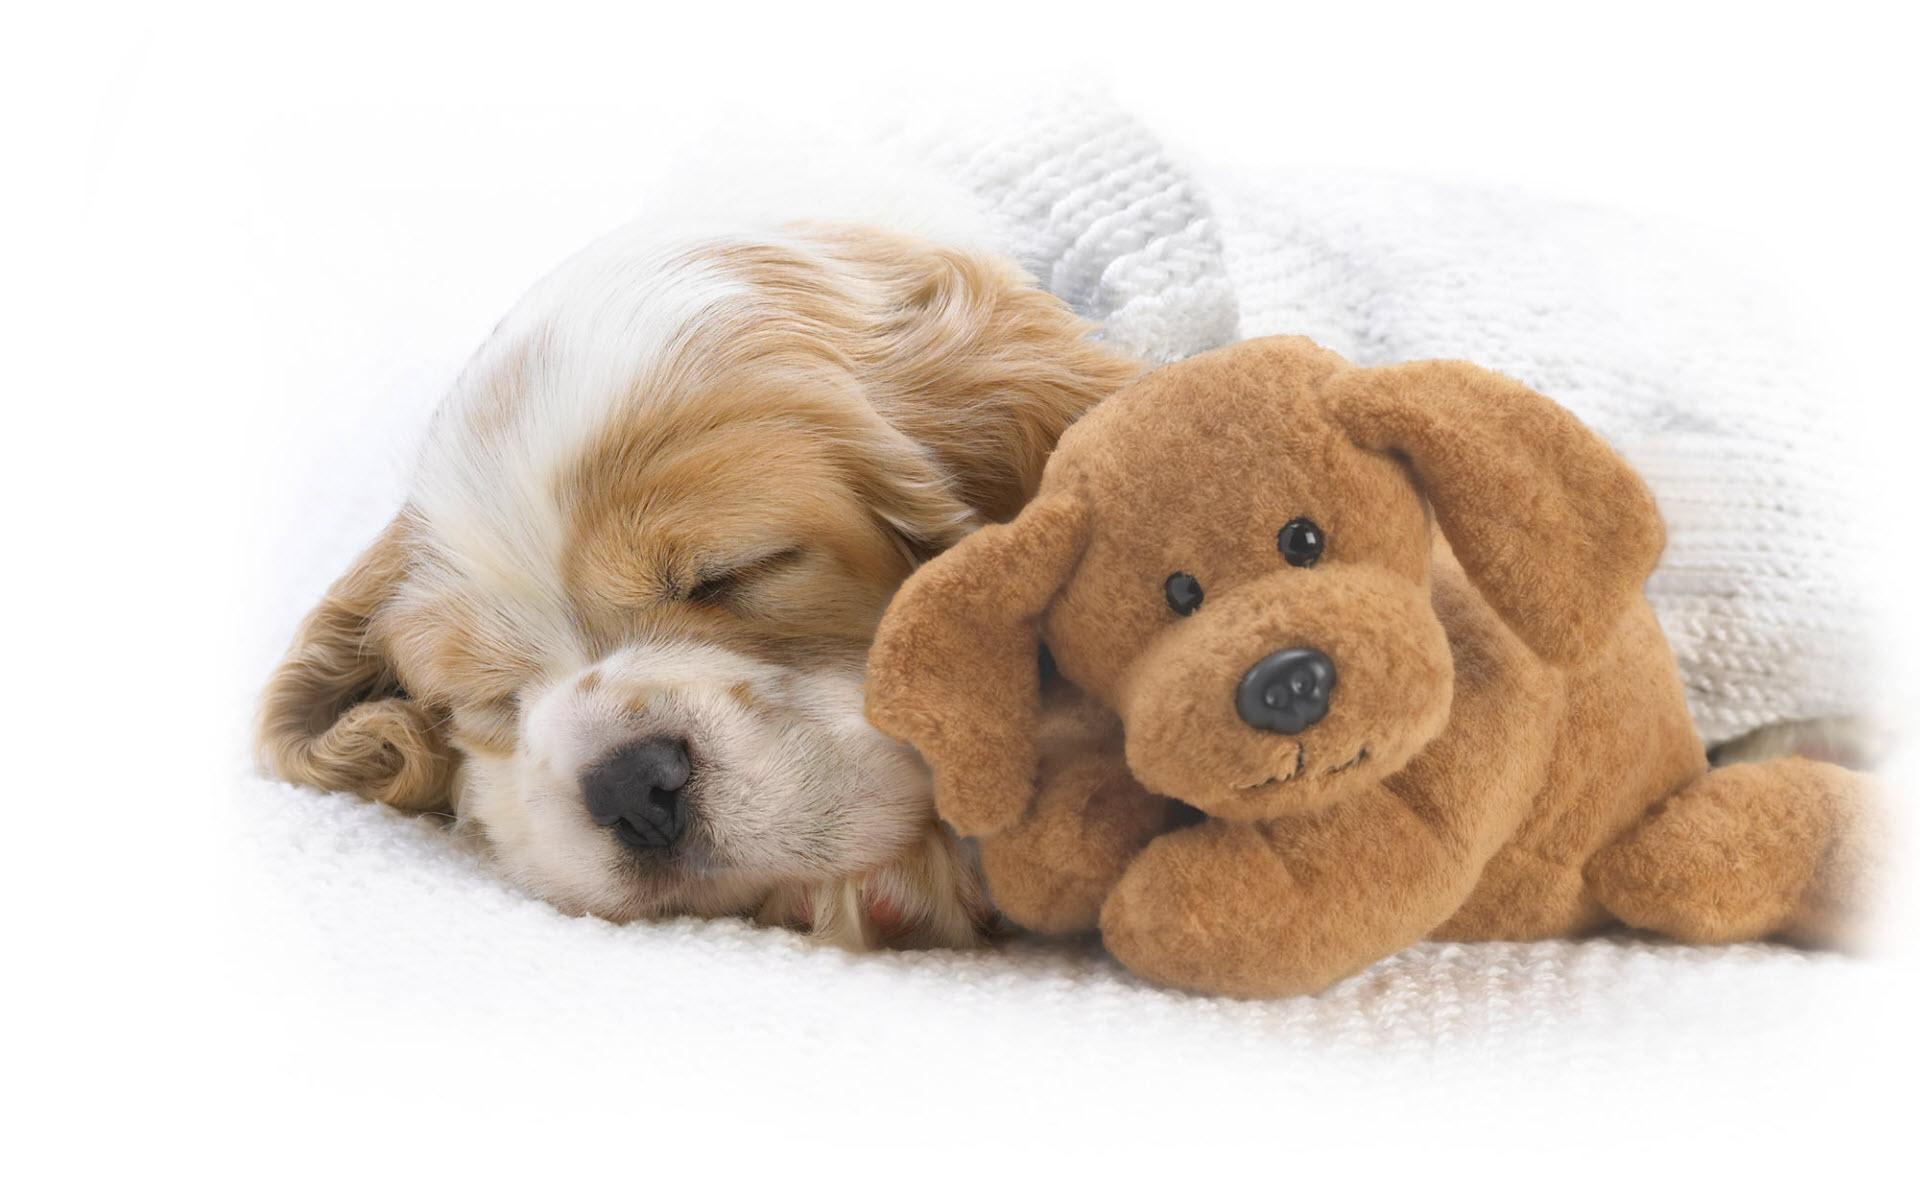 Sleeping Dog Wallpapers 40226 1920x1200 px HDWallSourcecom 1920x1200